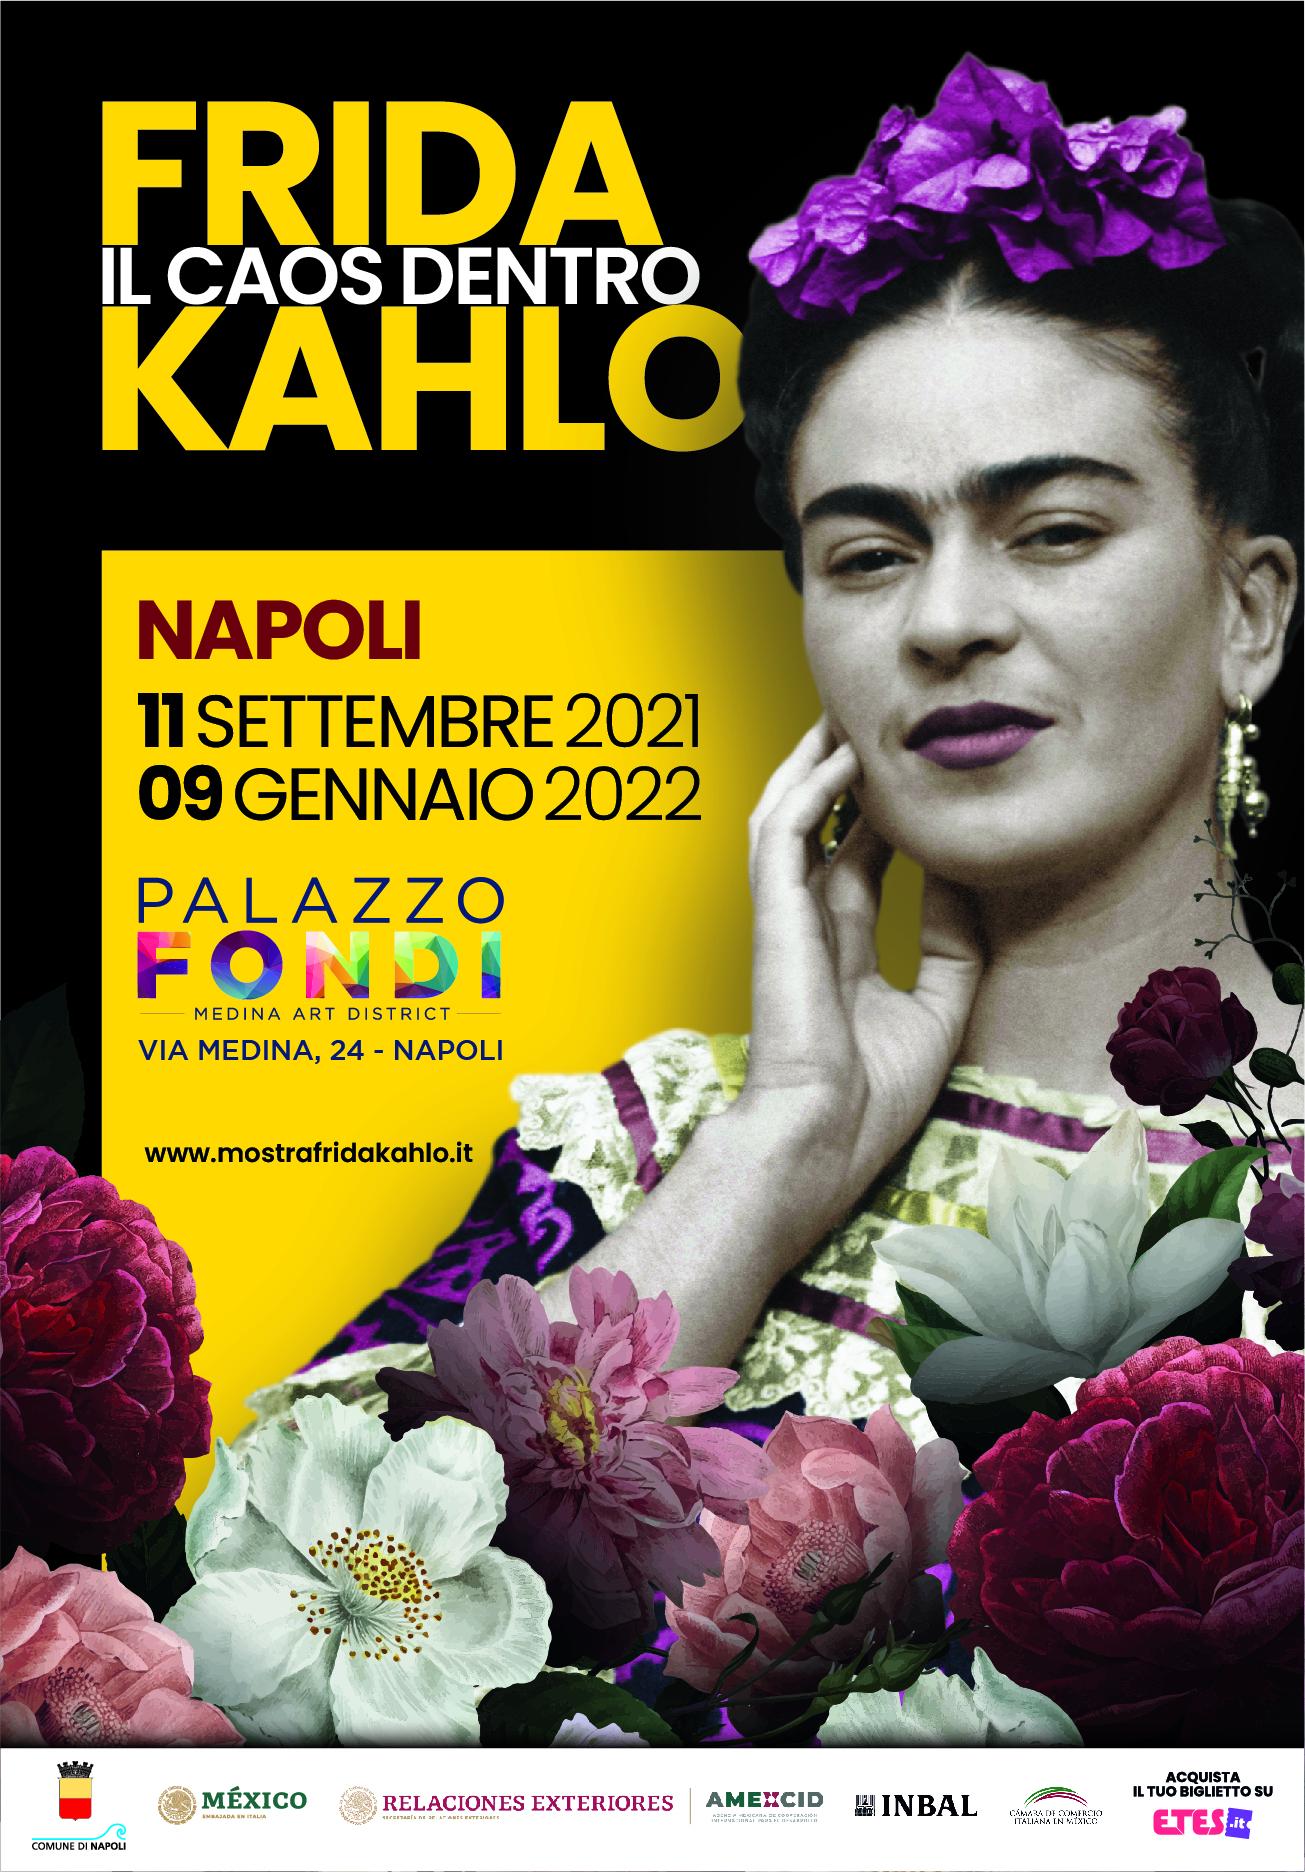 Napoli accoglie Frida